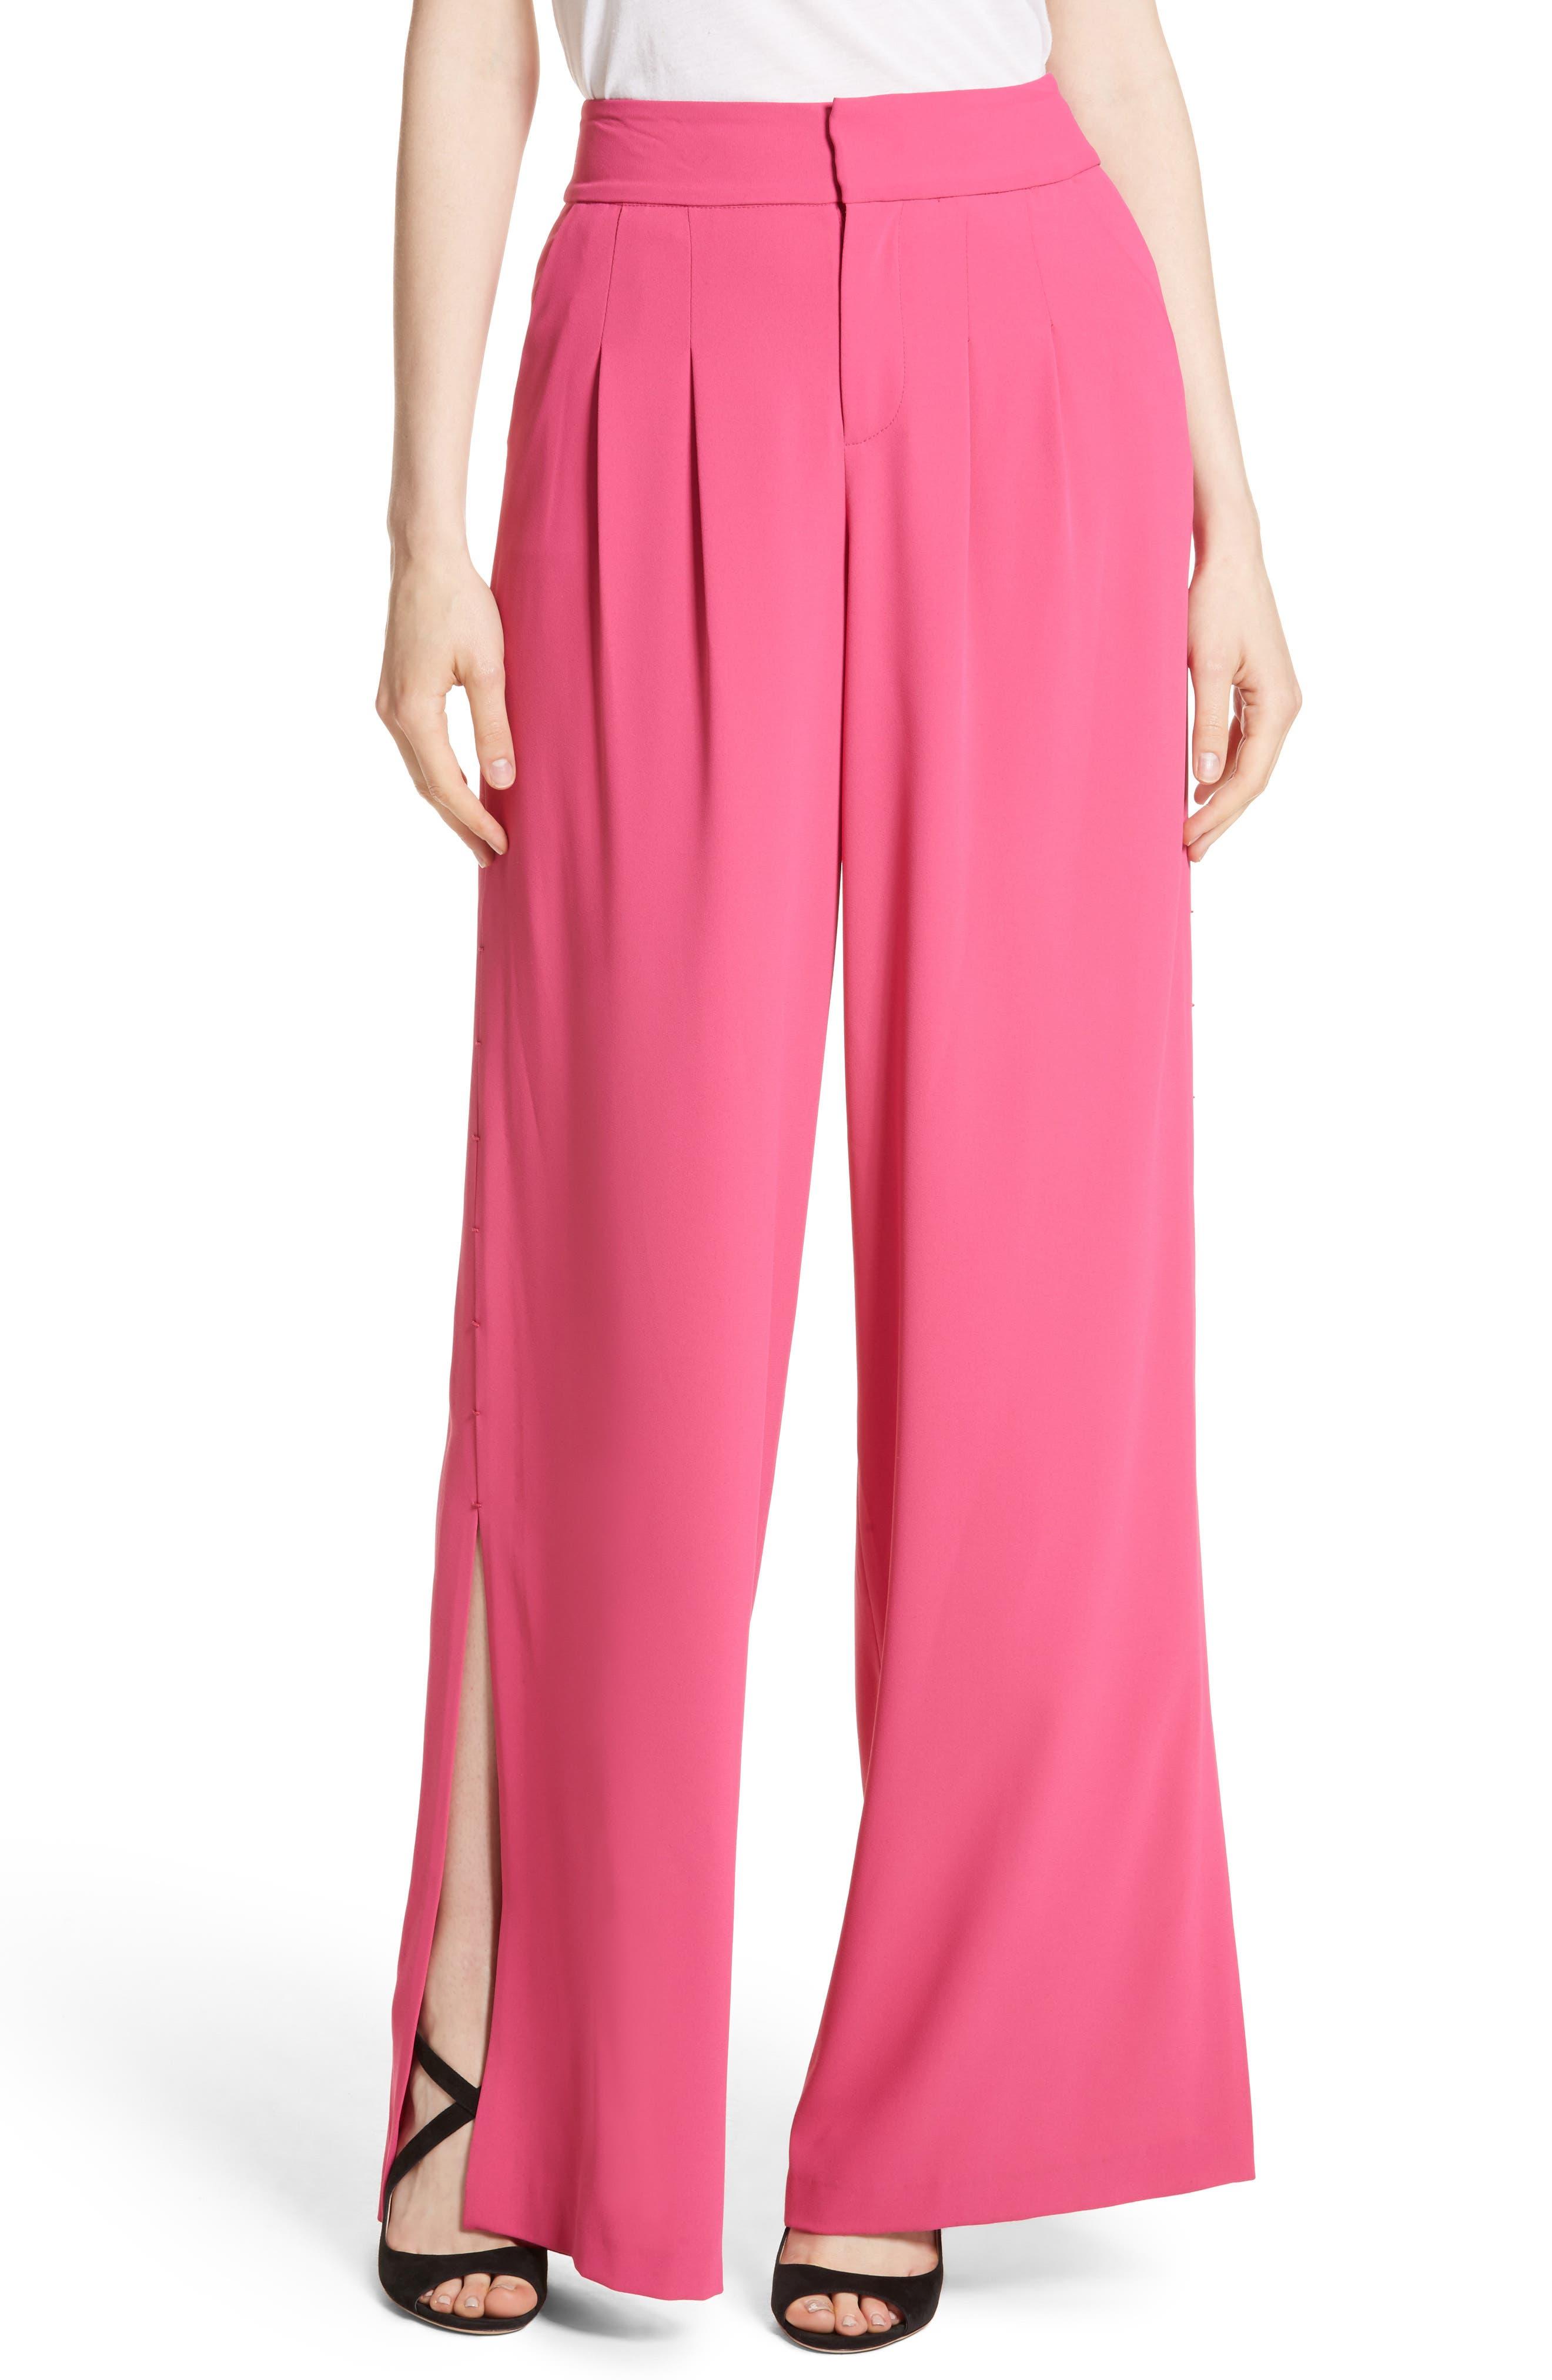 Main Image - Alice + Olivia Shavon High Waist Side Slit Flare Pants